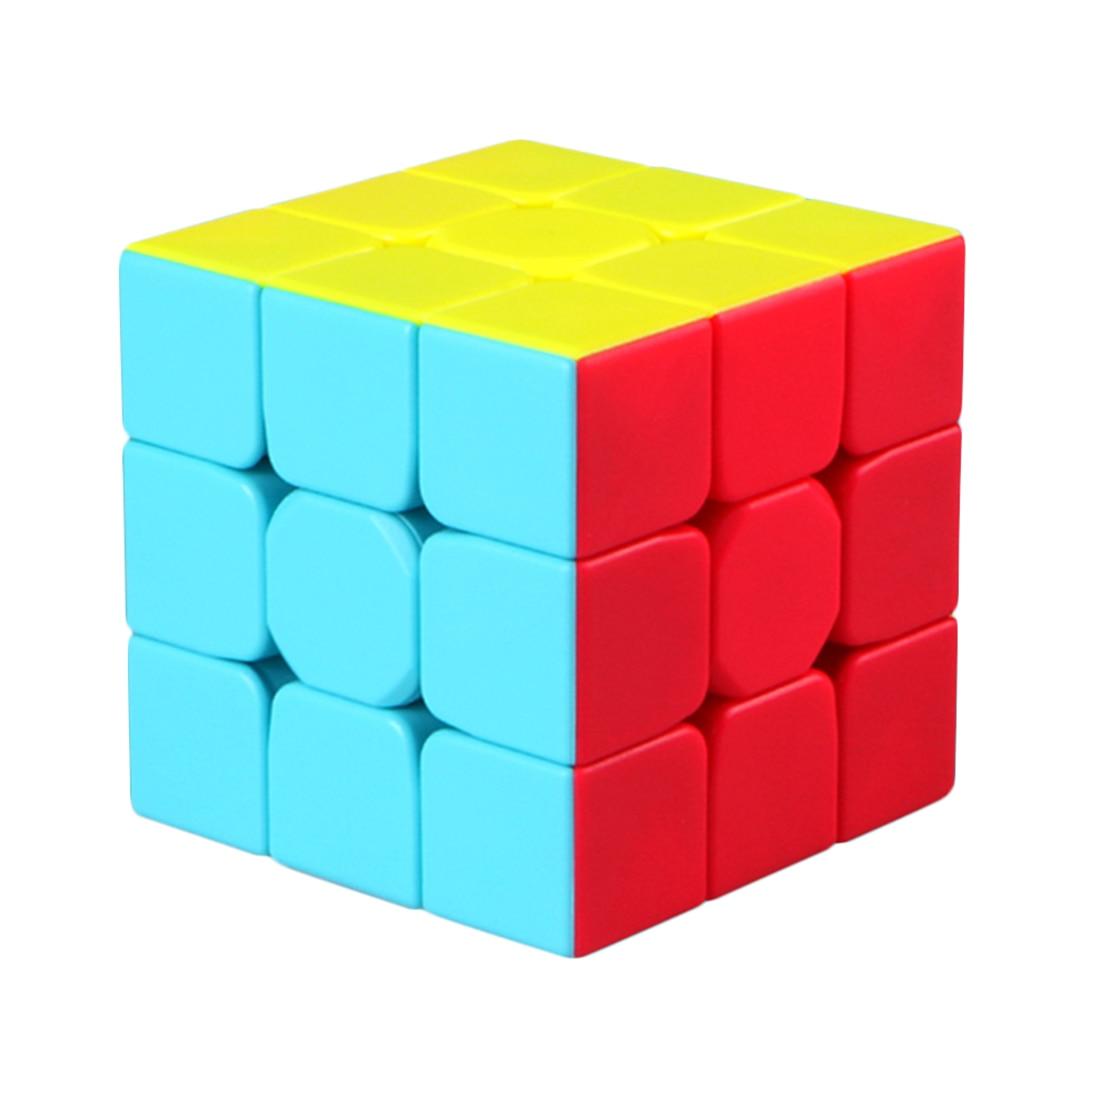 New Qiyi Mofangge Warrior 5.7cm 3*3*3 Speedcube Vivid Color Scheme